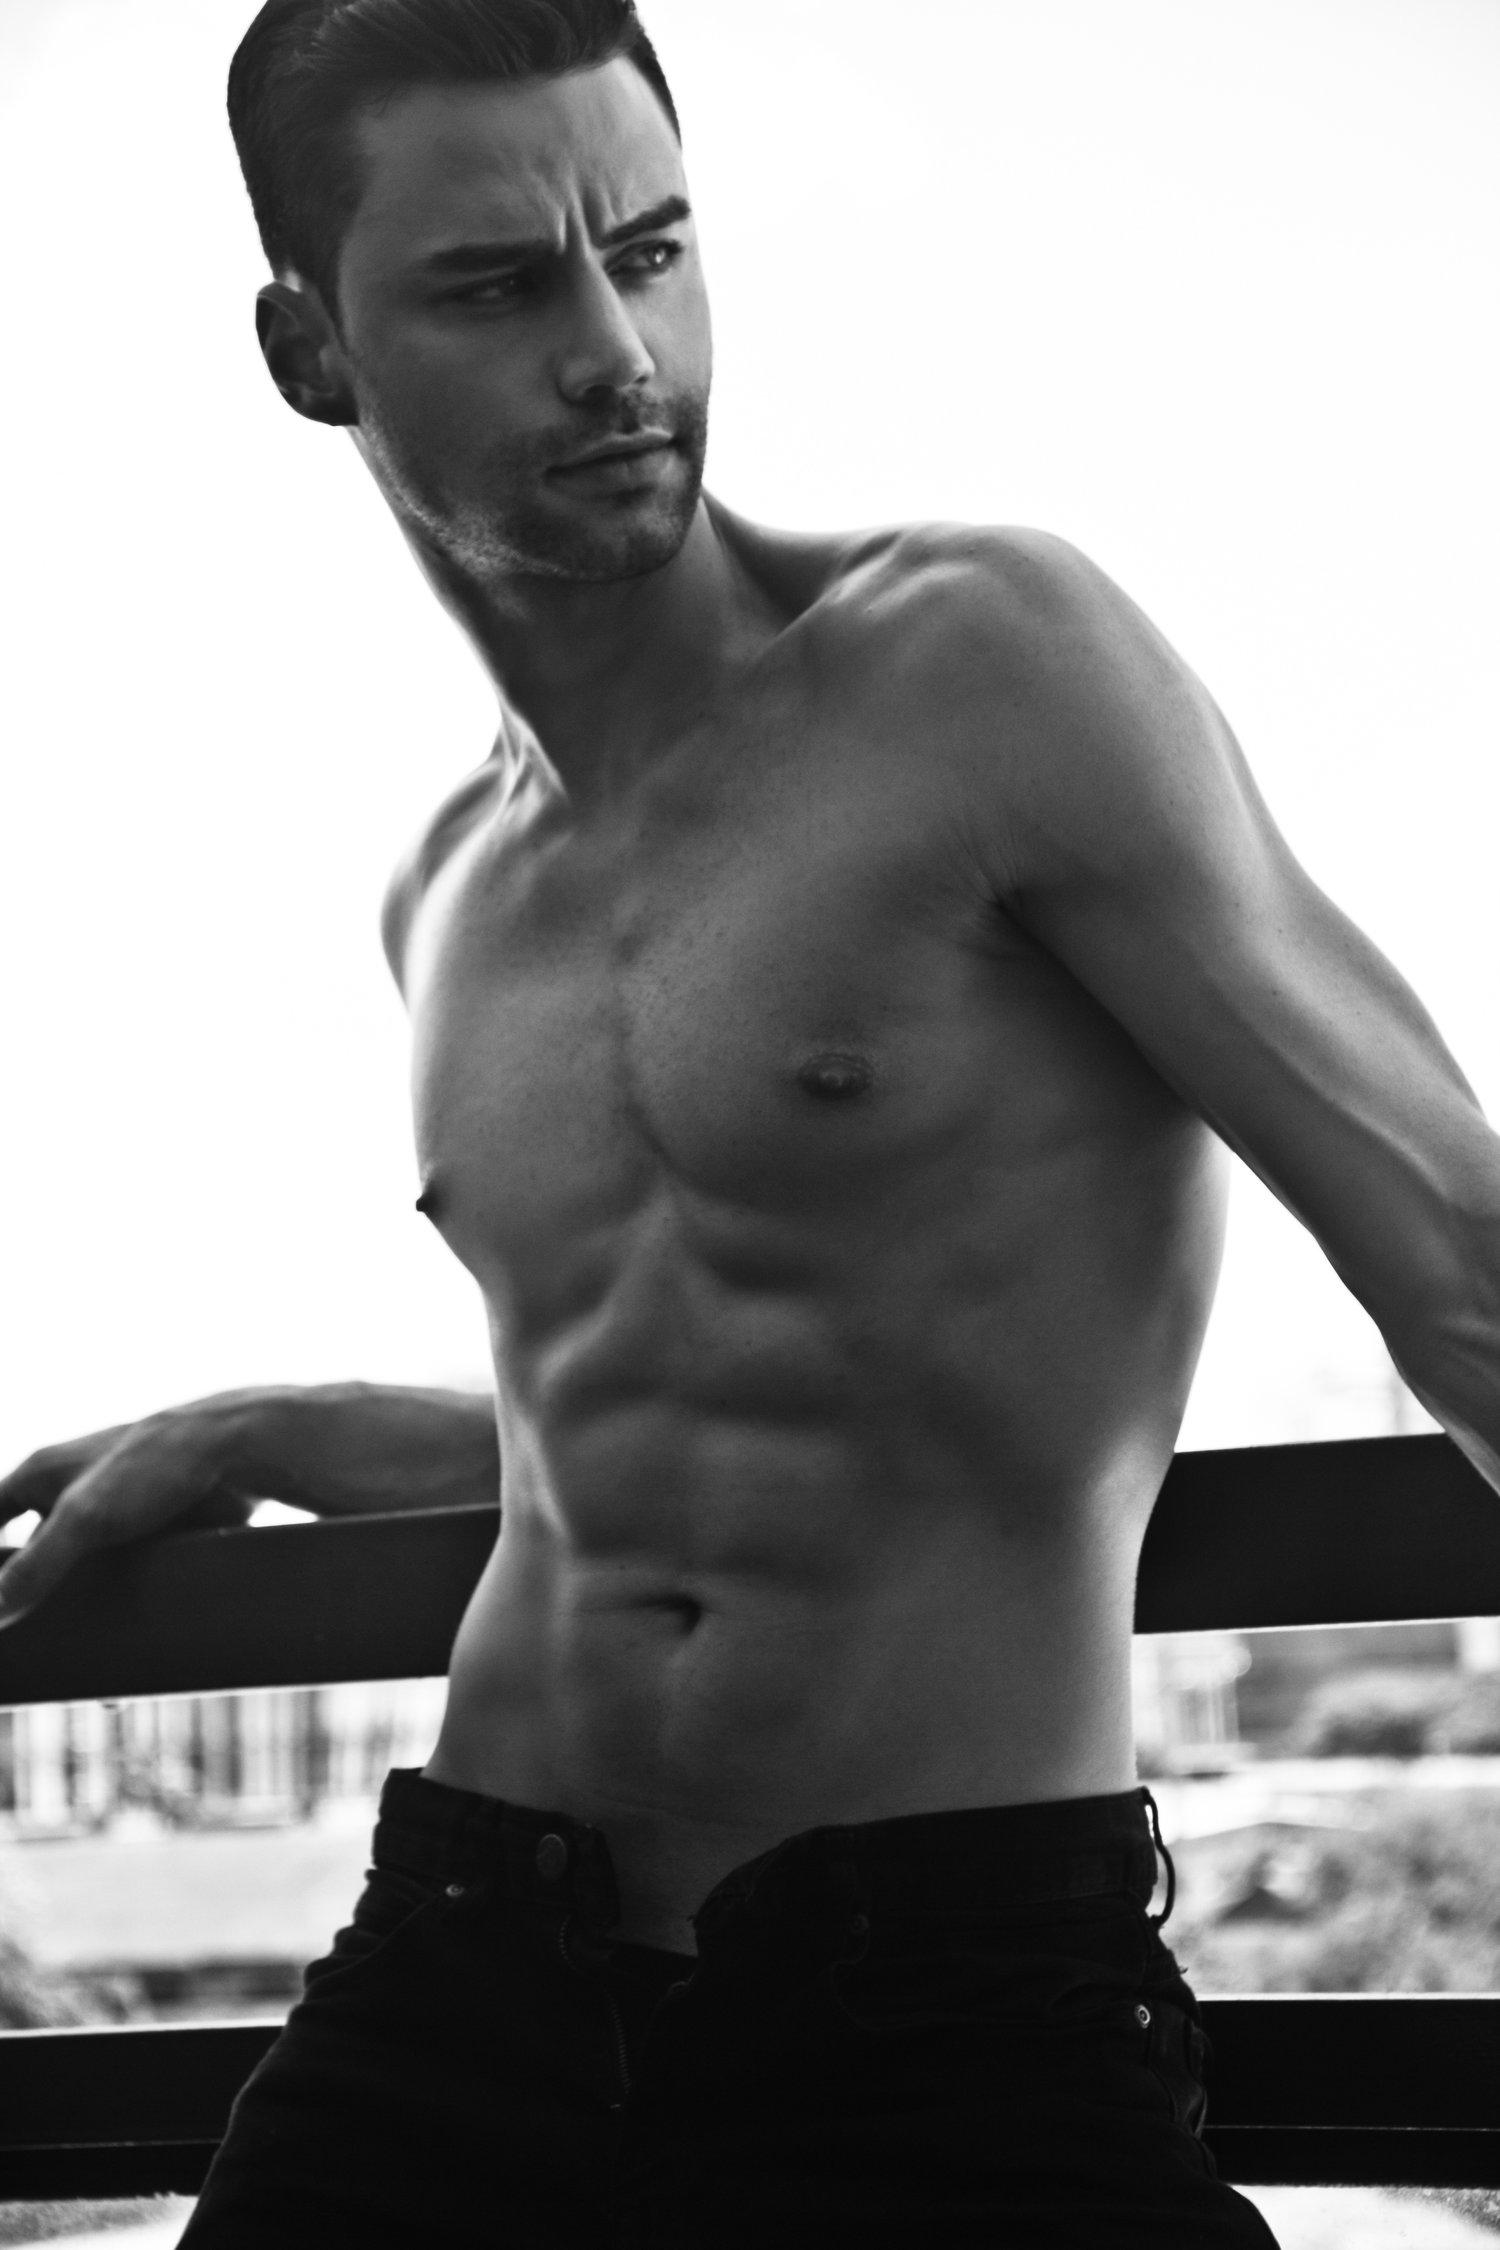 Adon Exclusive: Model Bruno Galli By Xram Ragde